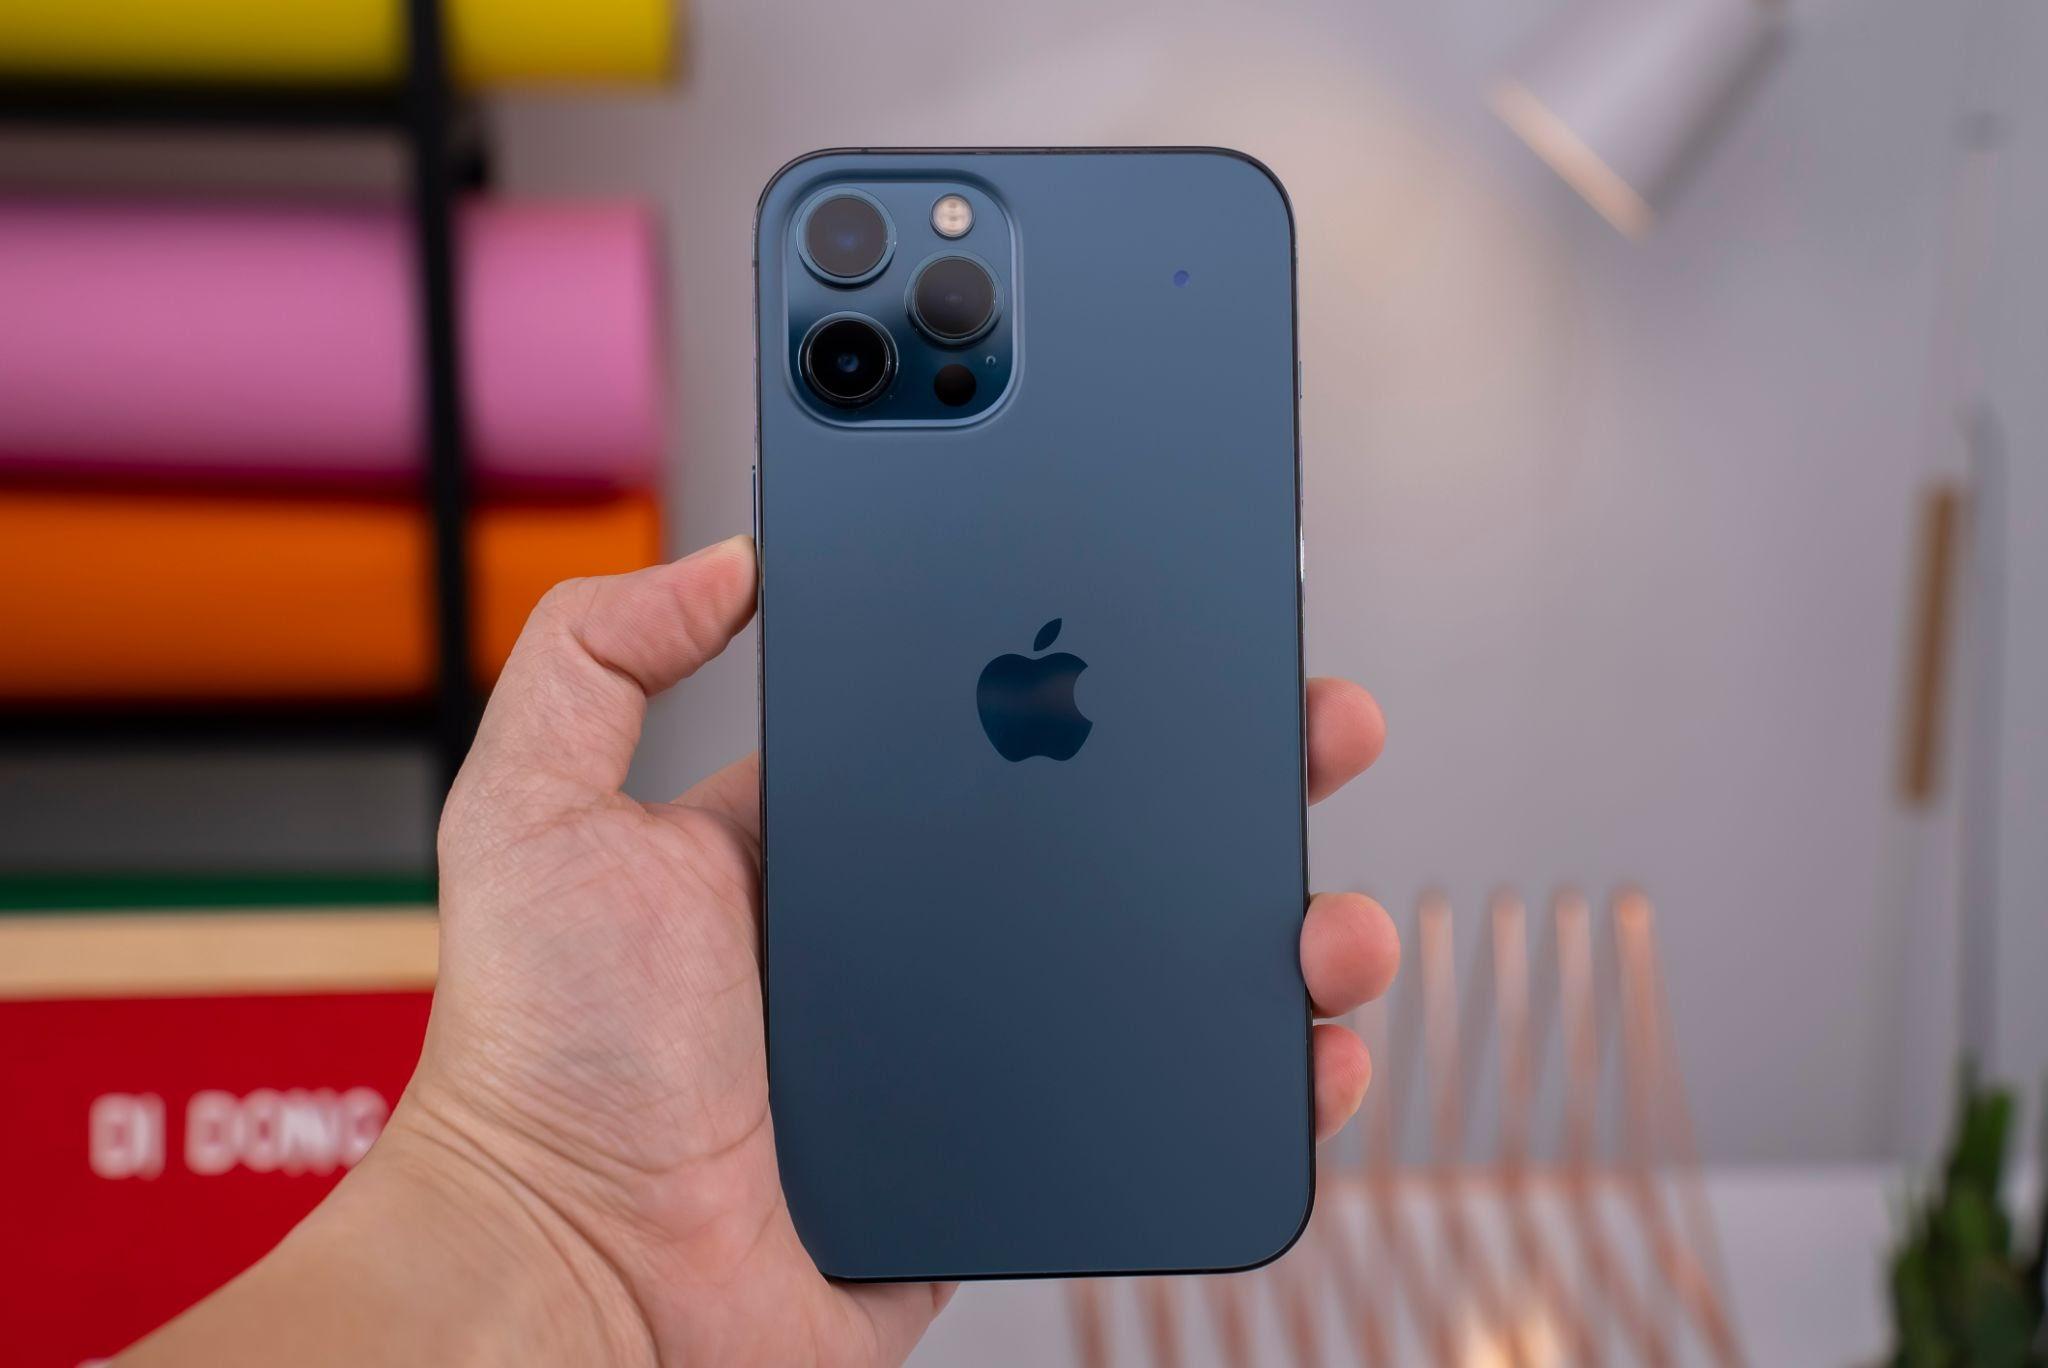 iPhone 13 chuẩn bị lên kệ, iPhone 12 giảm sốc gần 7 triệu 8